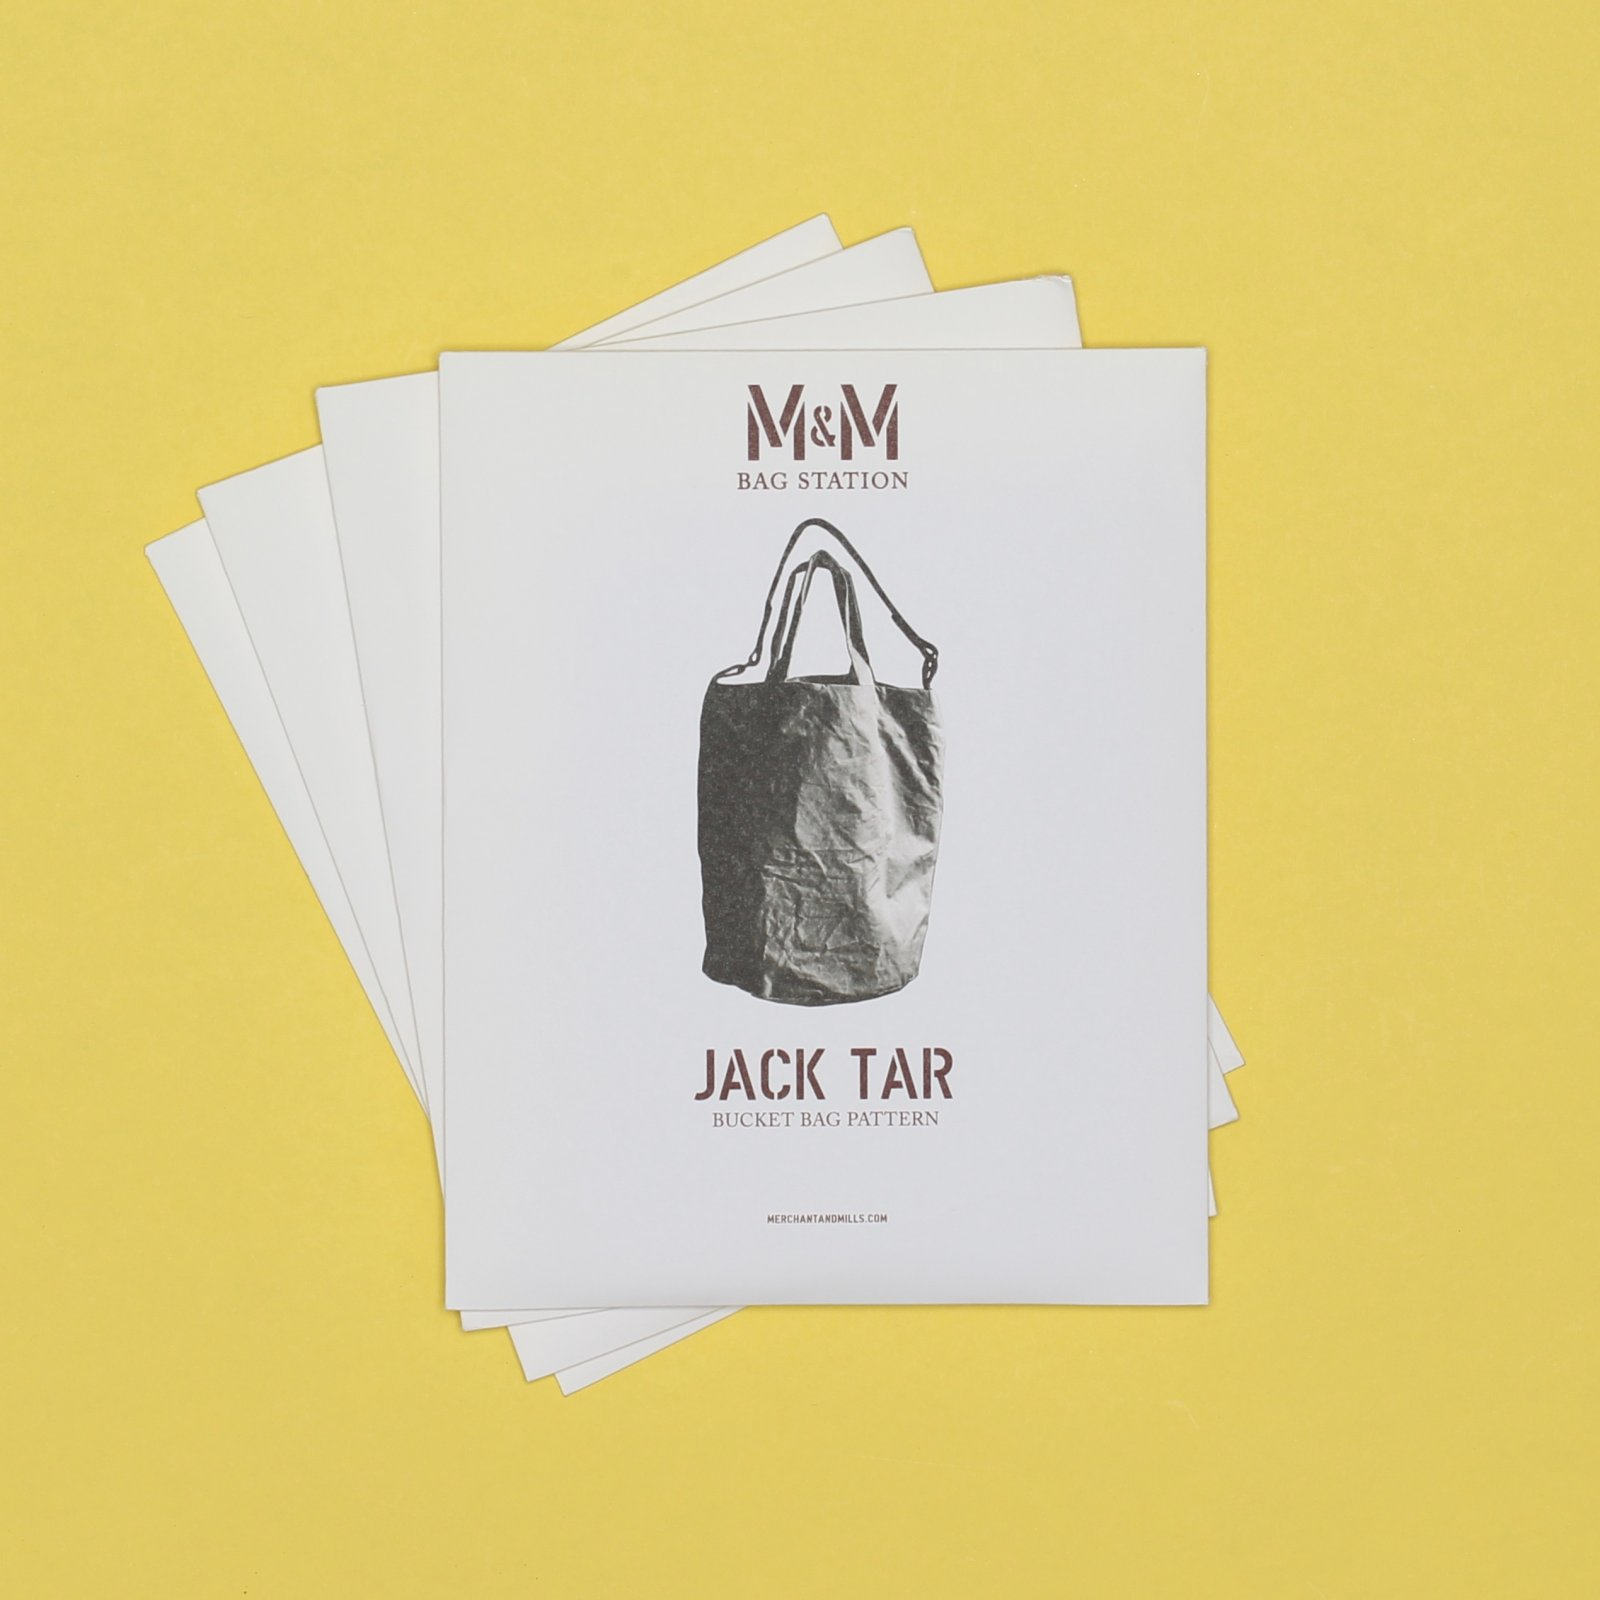 M&M PATTERN Jack Tar Bag Pattern